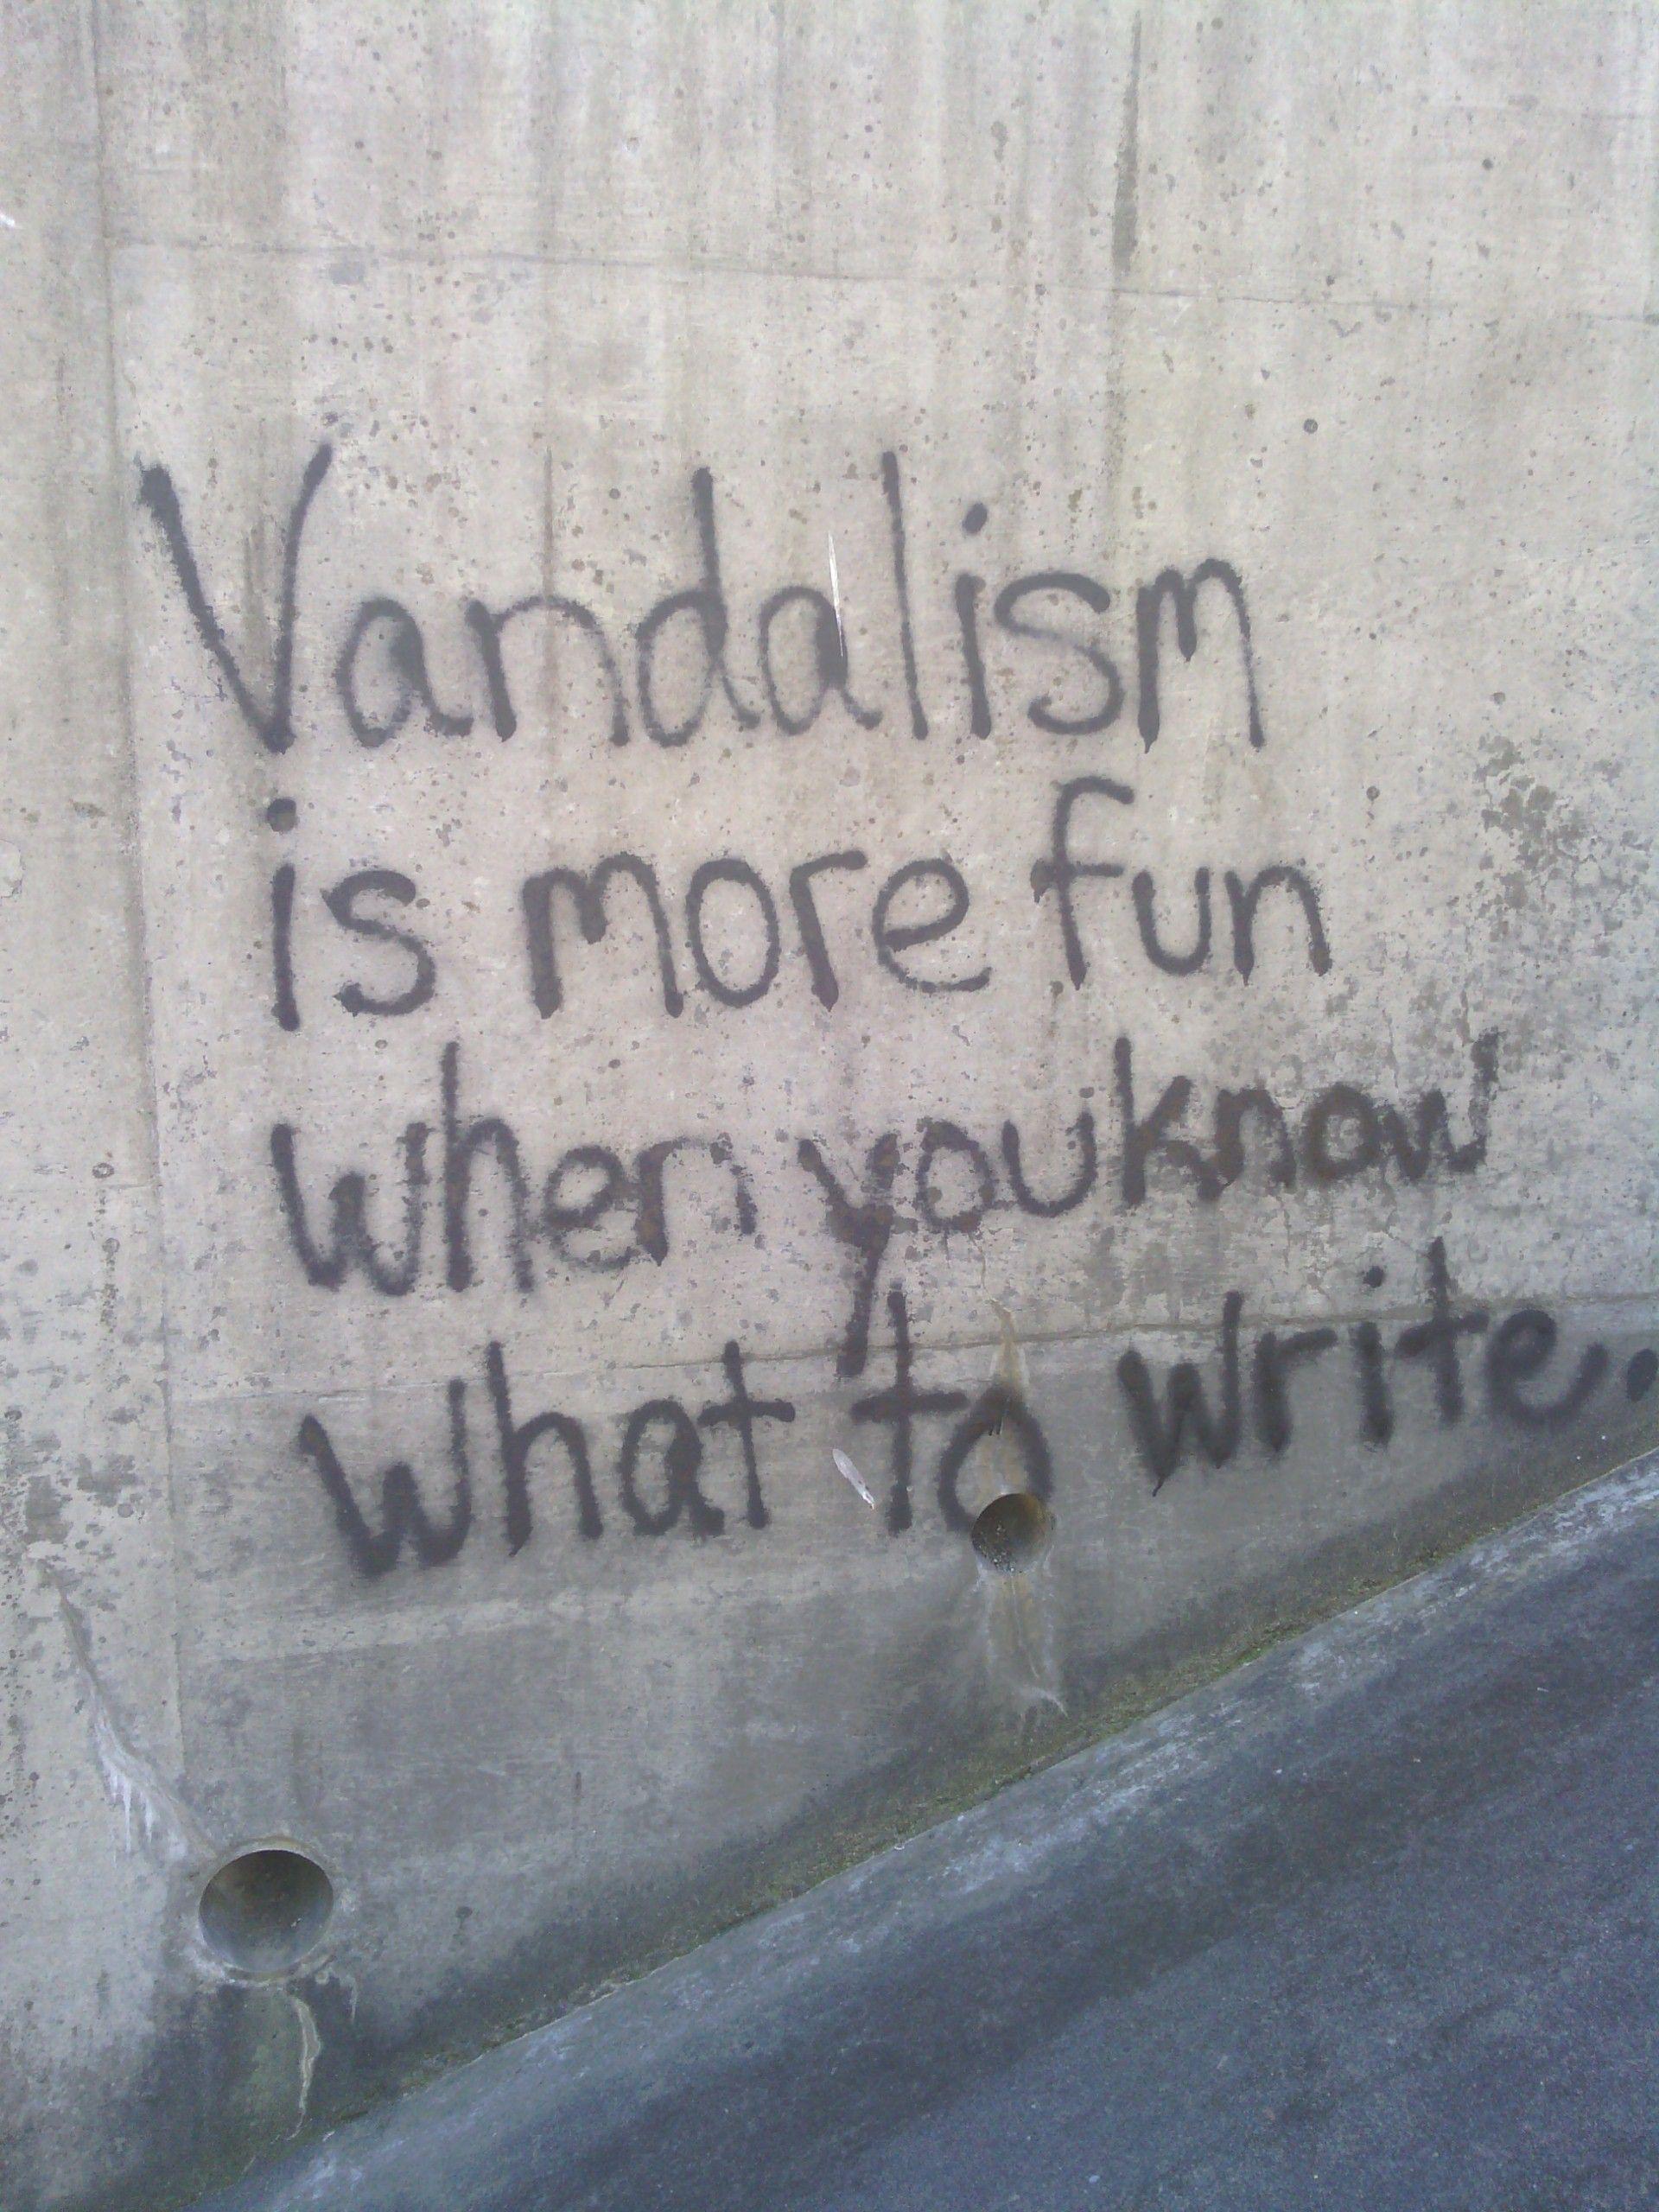 Graffiti art quotes -  Vandalism Is More Fun When You Know What To Write Graffiti Streetart